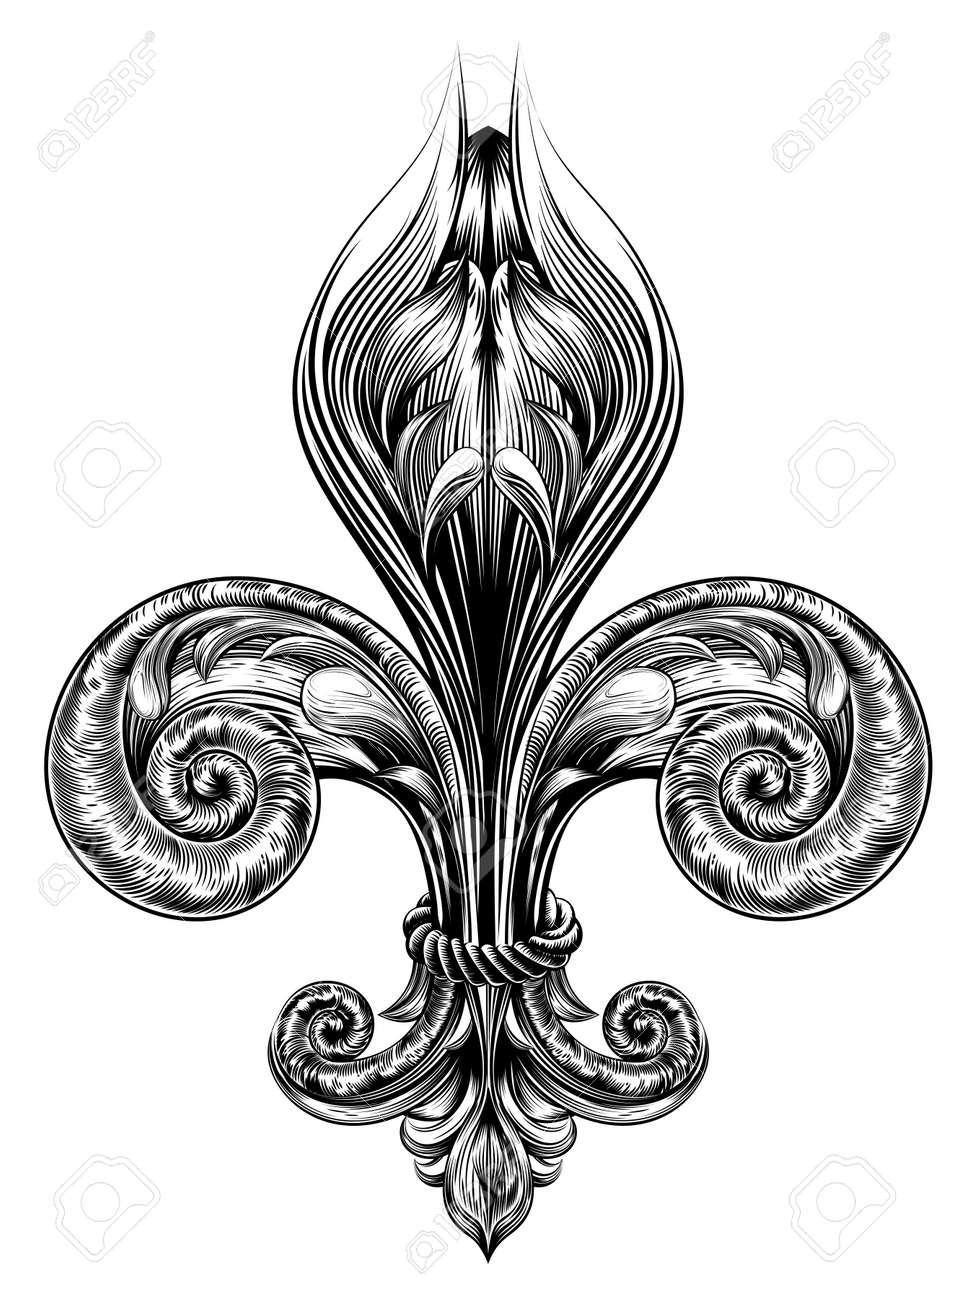 Fleur De Lis Decorative Design Element Or Heraldic Symbol In A Vintage Woodblock Style Stock Vector